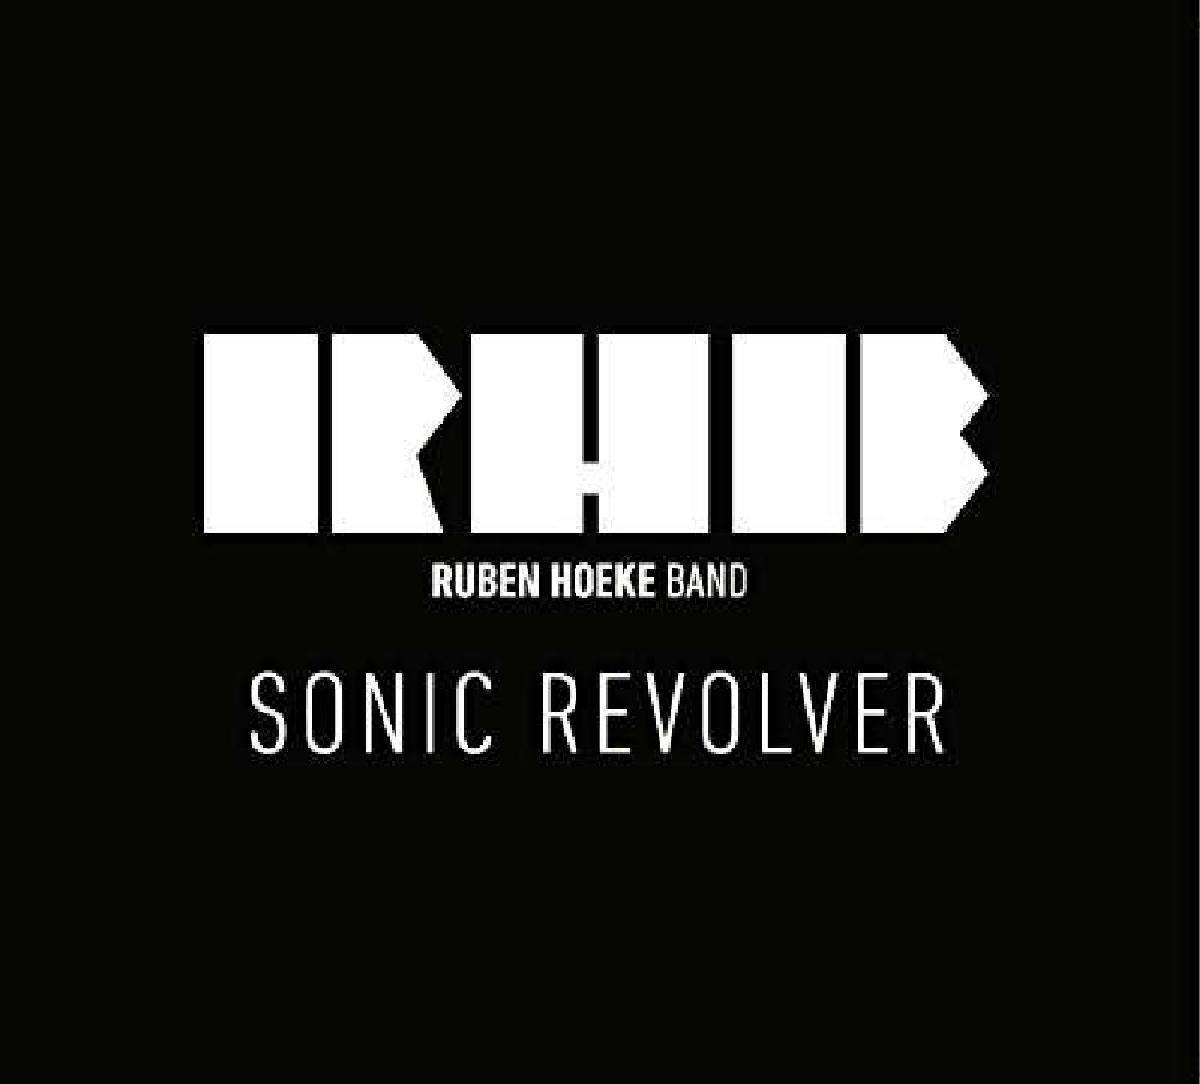 Hoeke Ruben - Sonic Revolver - Ruben -Band- Hoeke